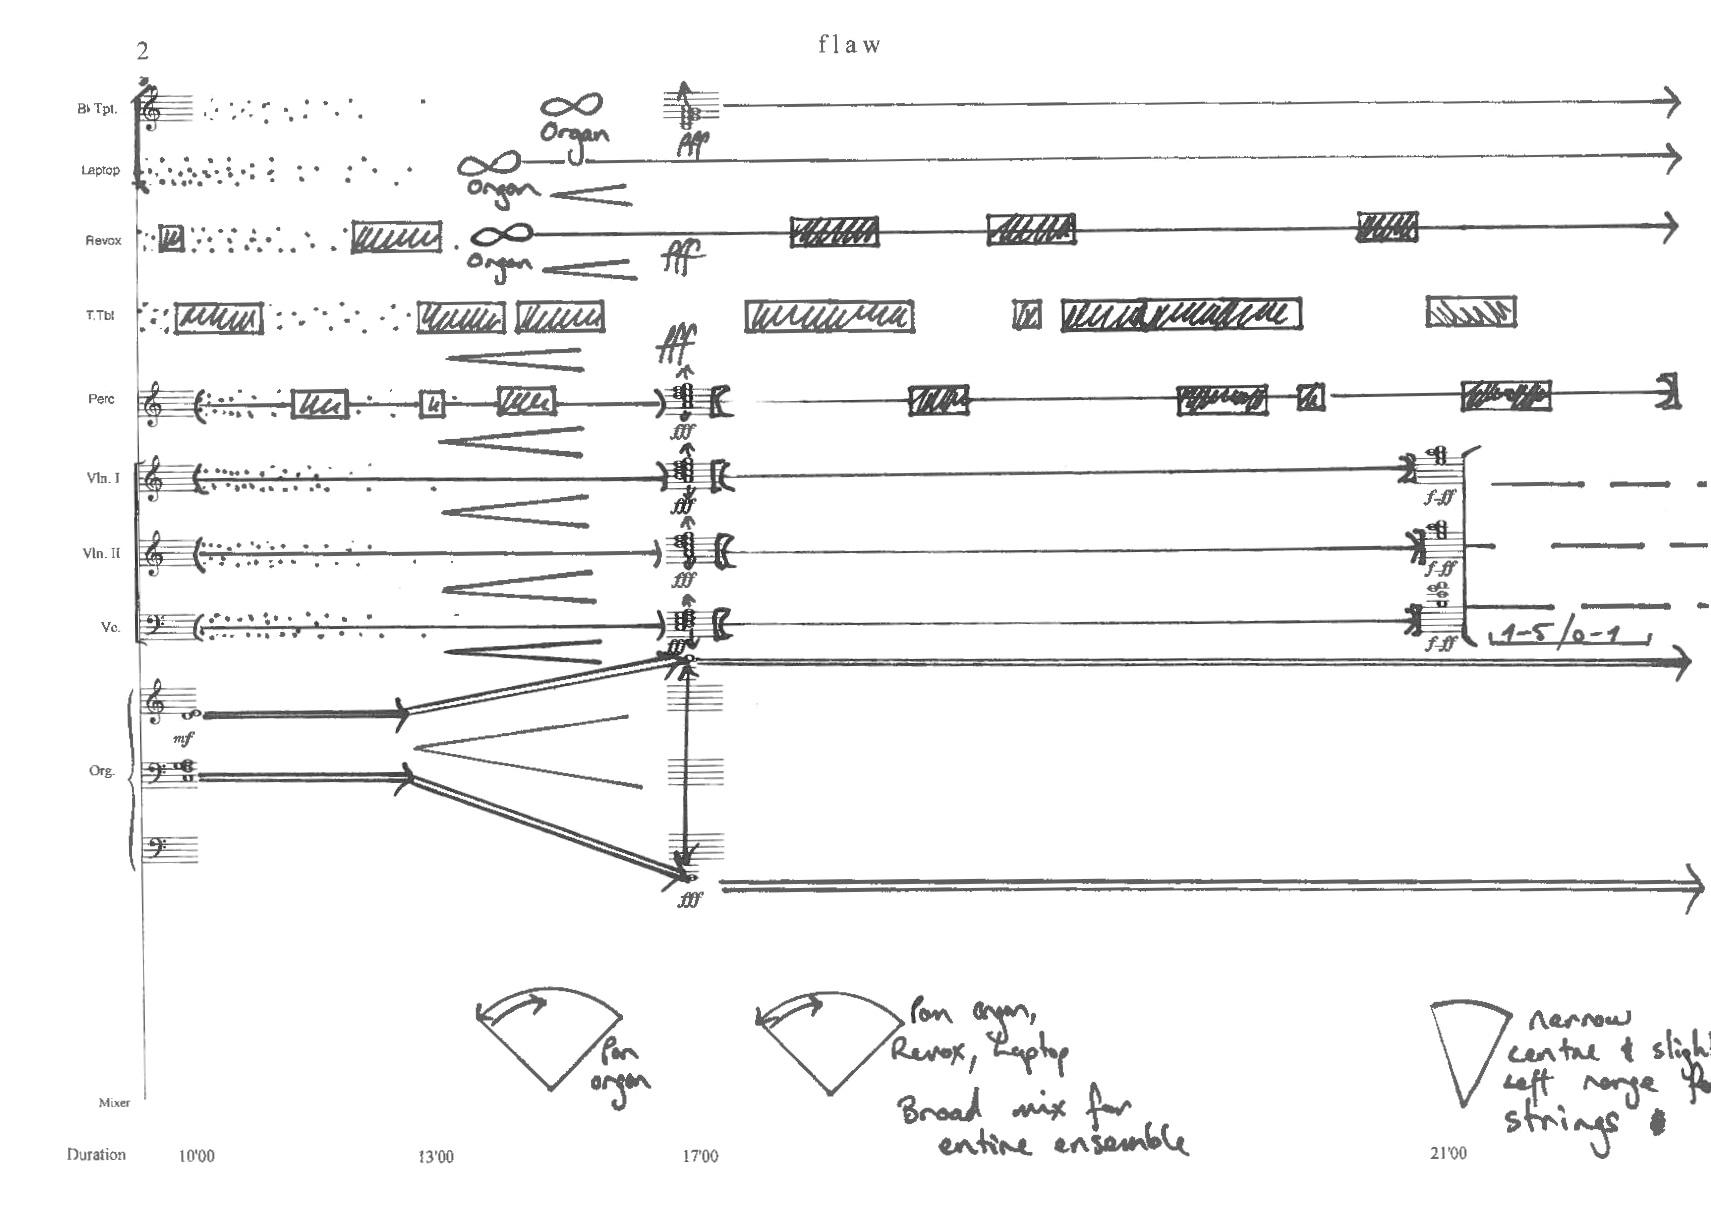 FLAW - Draft 1 (dragged) 1-page-001.jpg